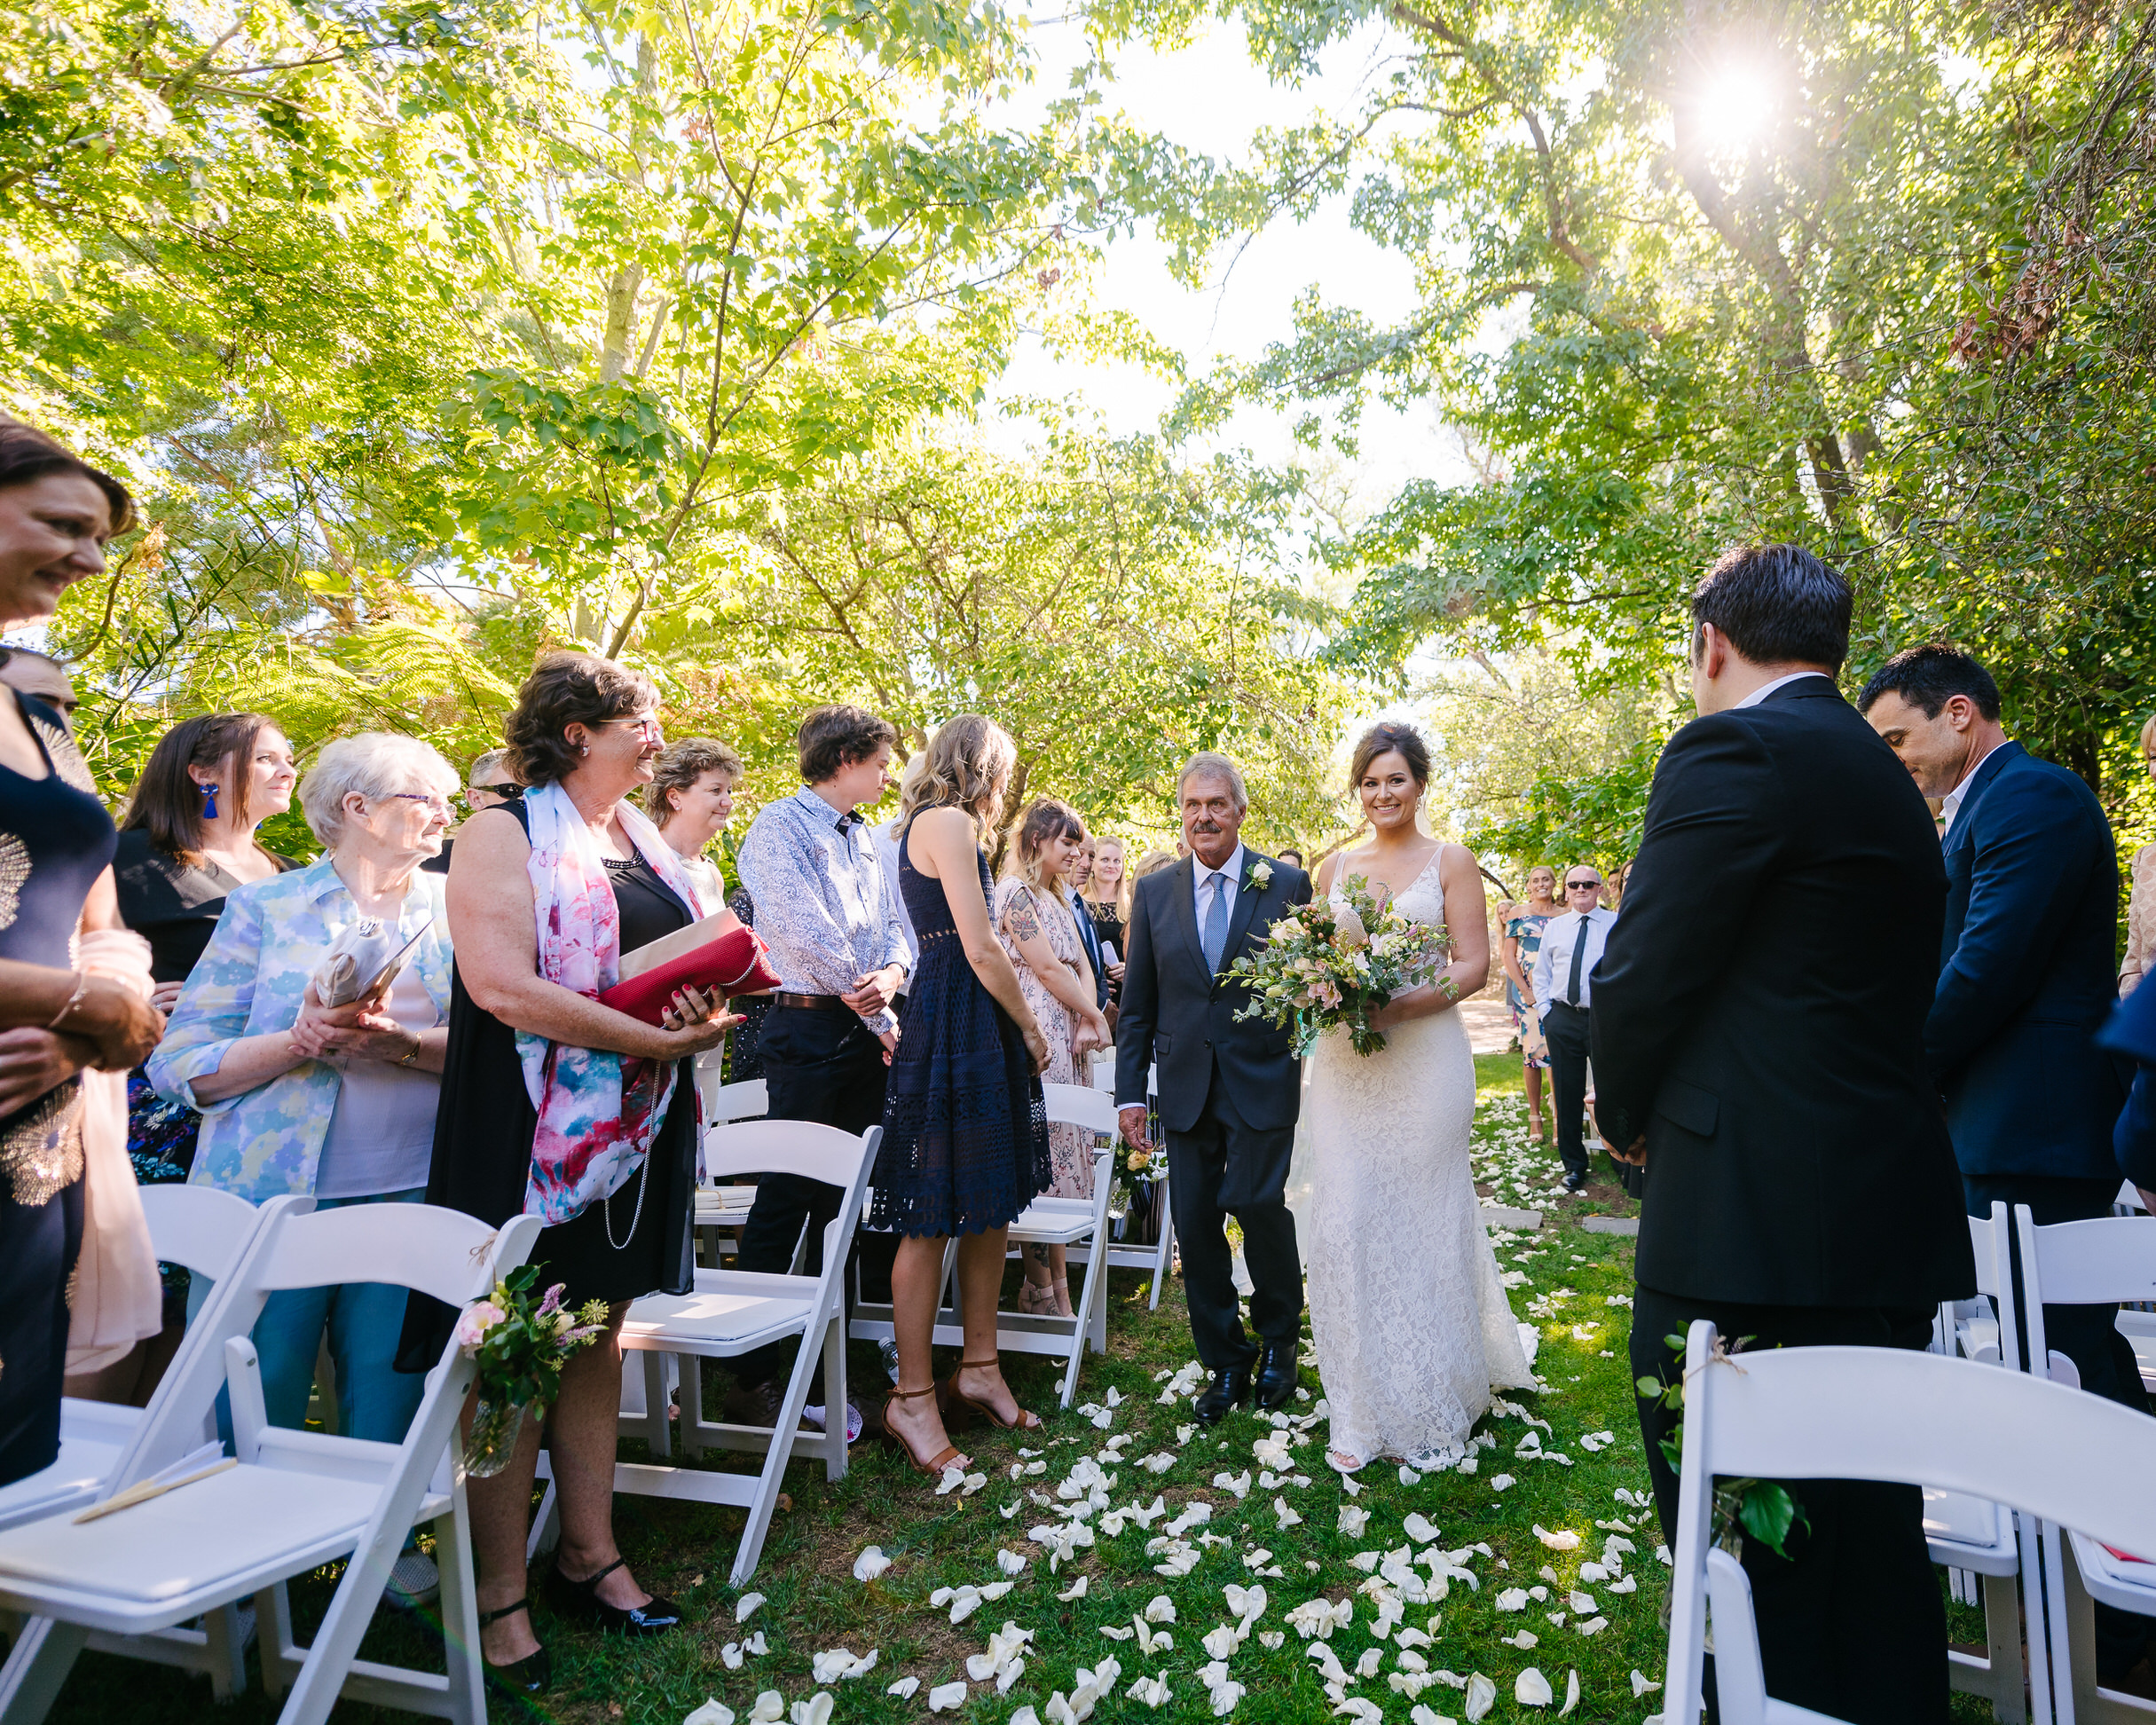 Justin_And_Jim_Photography_Chateau_Dore_Bendigo_Wedding31.JPG